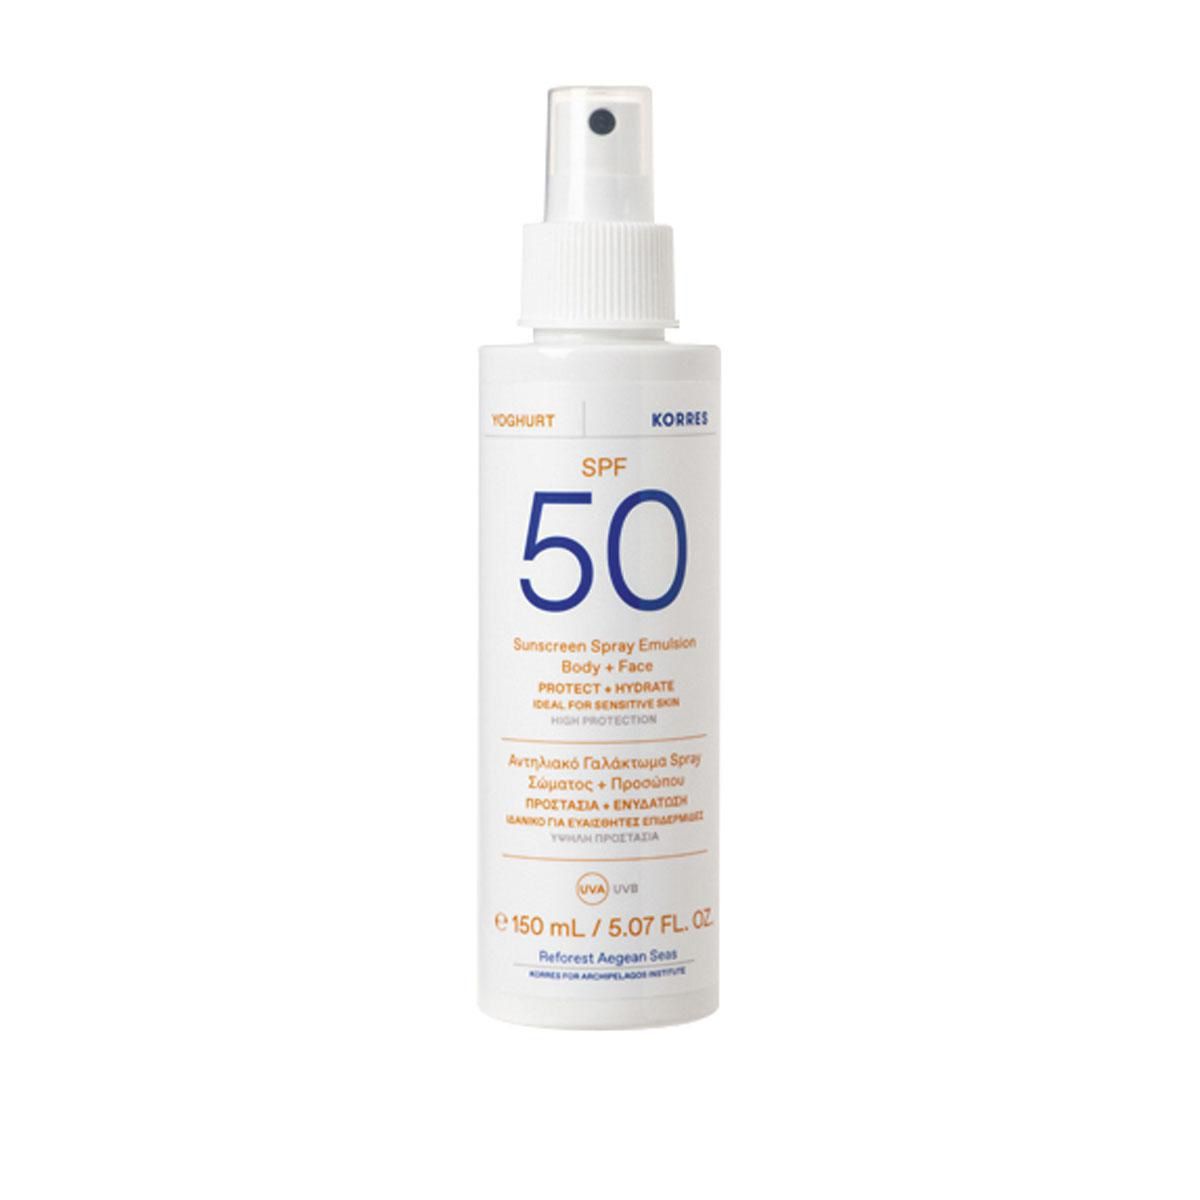 Yoghurt Sunscreen Spray Emulsion Body + Face SPF50, Korres, 24,90 euros, PACKSHOTS: SDP